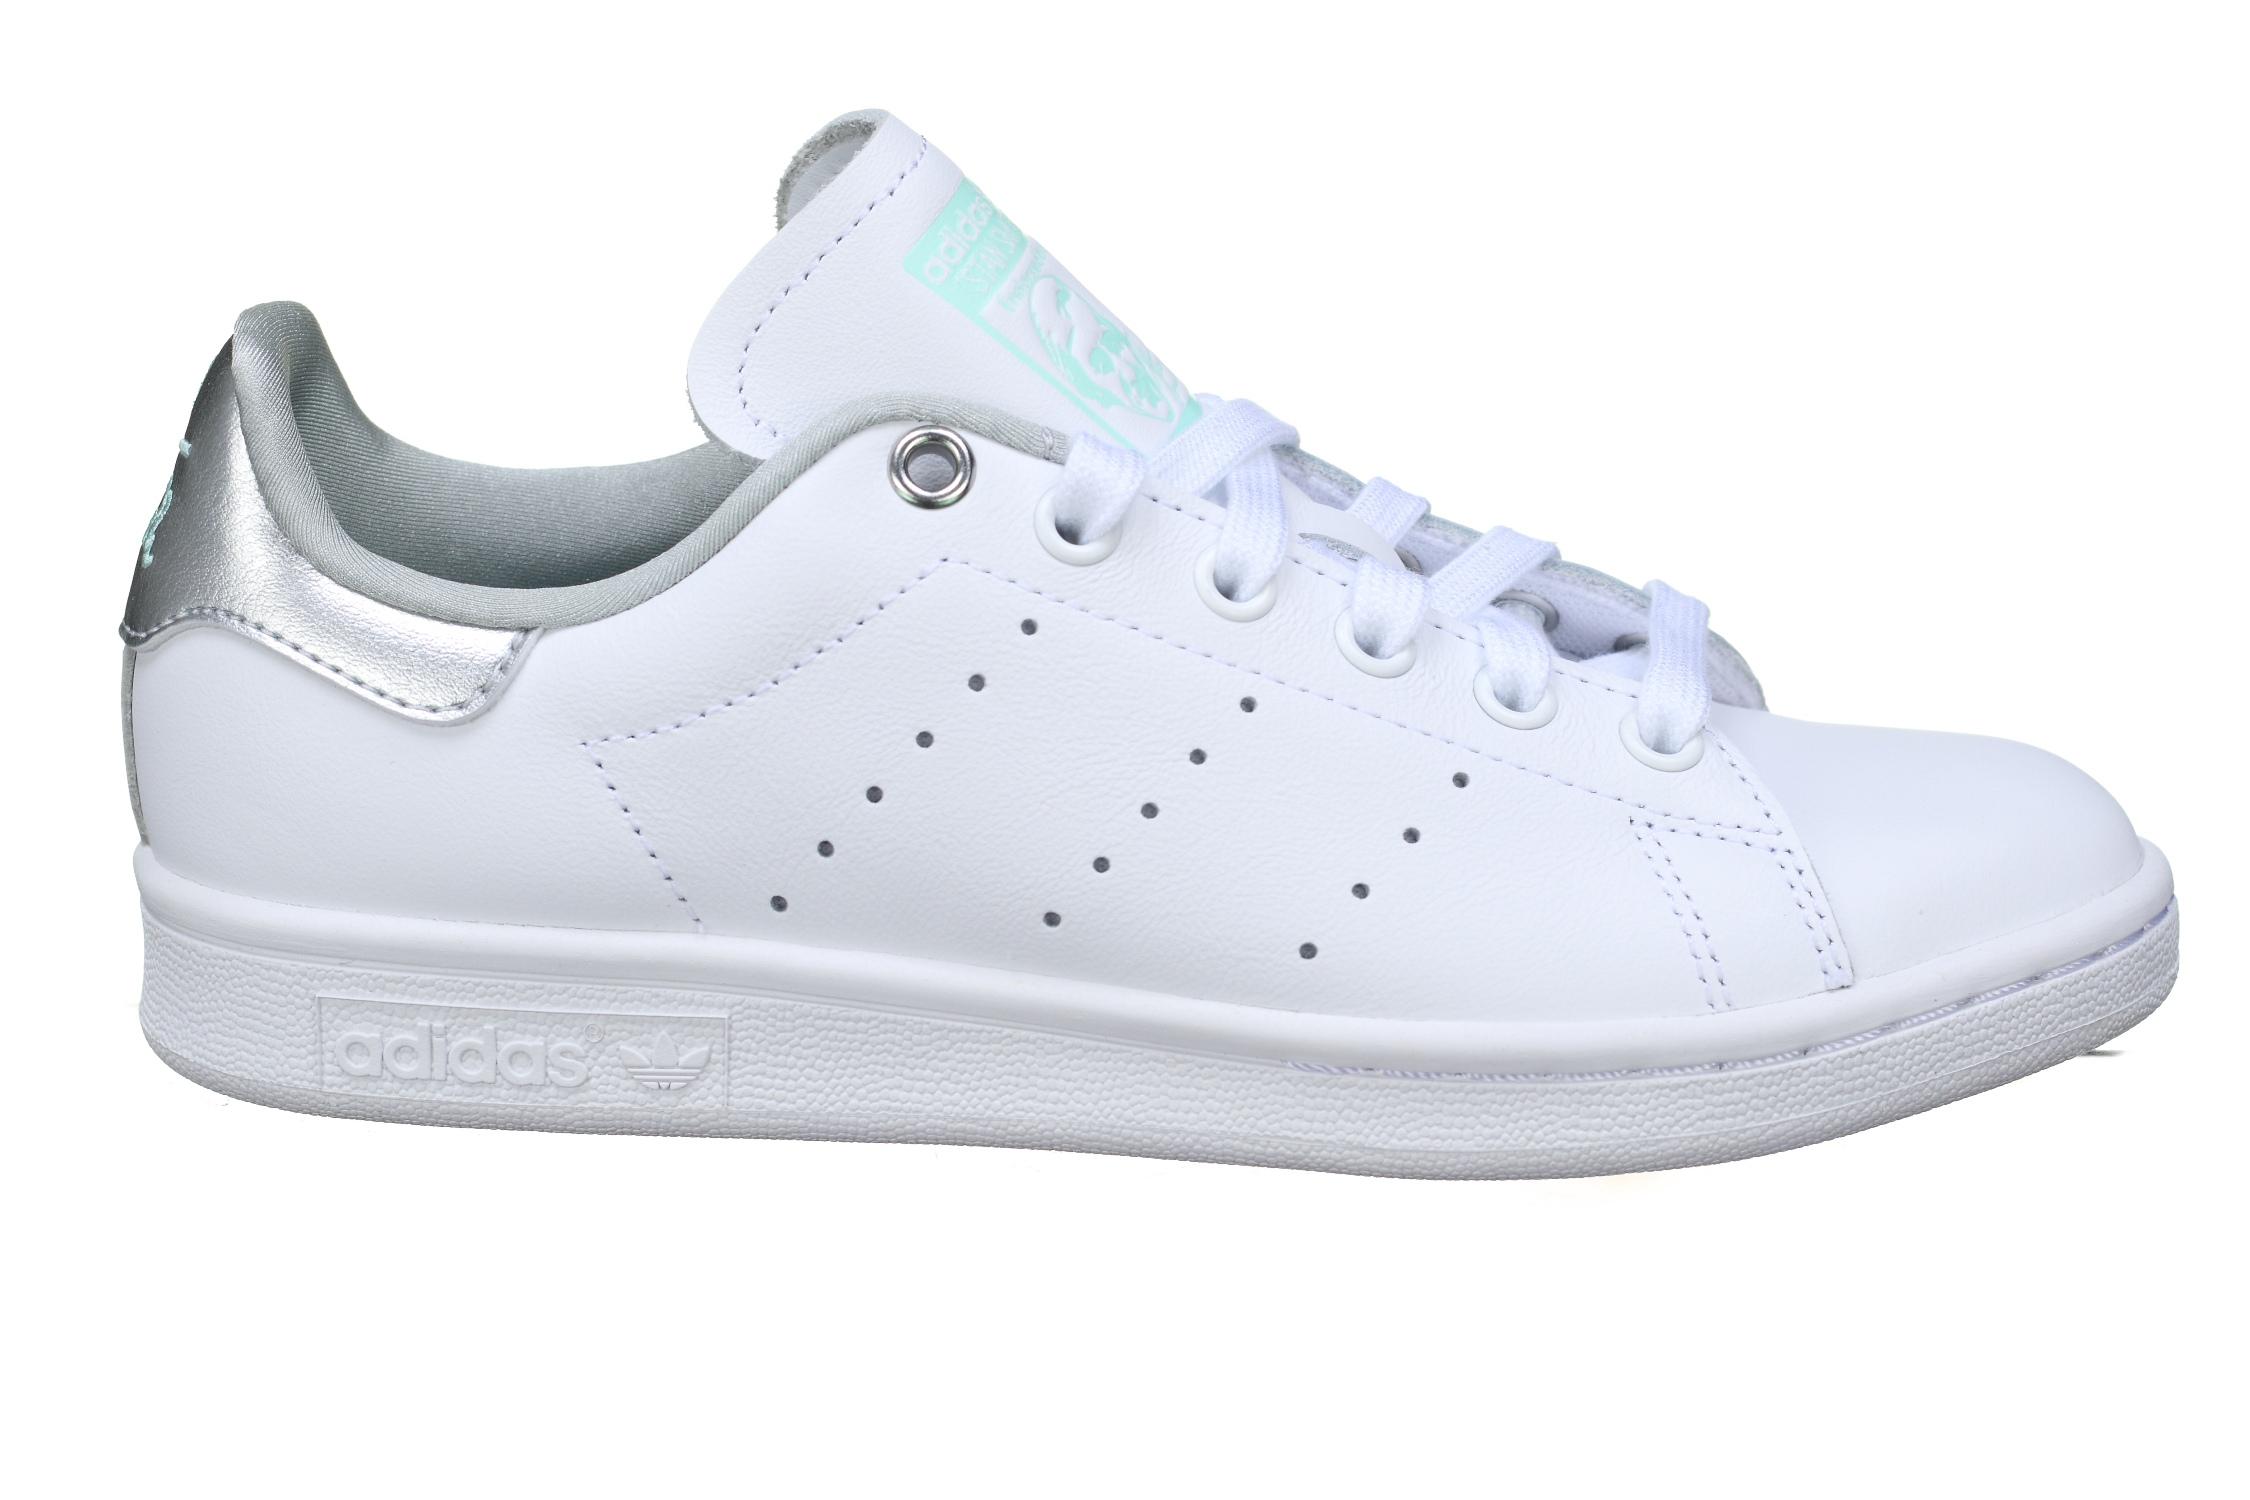 https://www.leadermode.com/172442/adidas-stan-smith-w-g27907-blanc.jpg